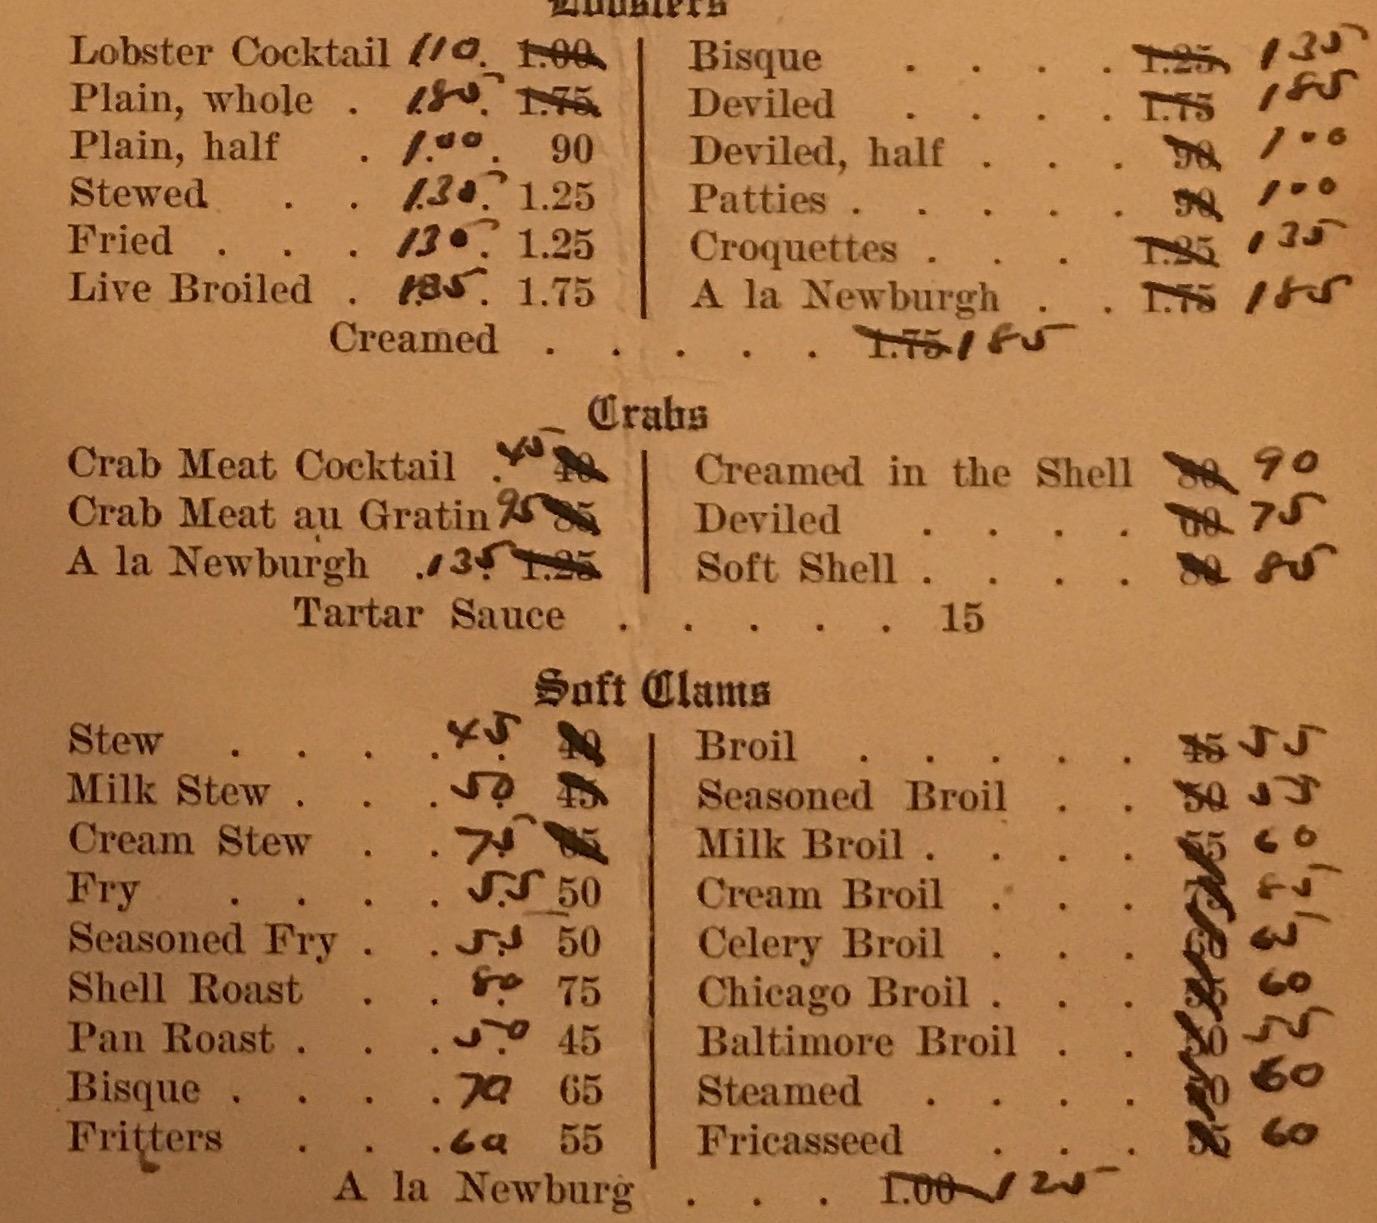 menu 1919 2 lobsters.jpeg